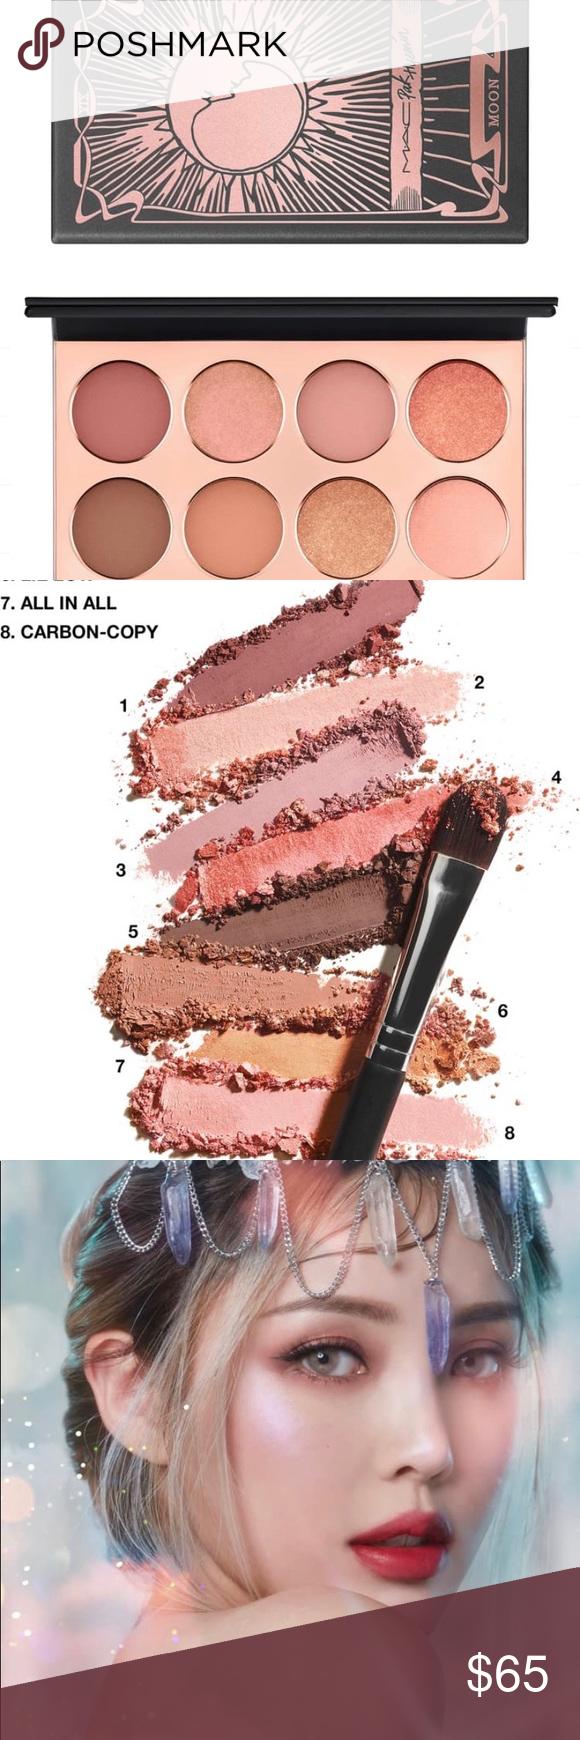 Mac x Pony Park hocus Pocus Eye shadow palette Eyeshadow